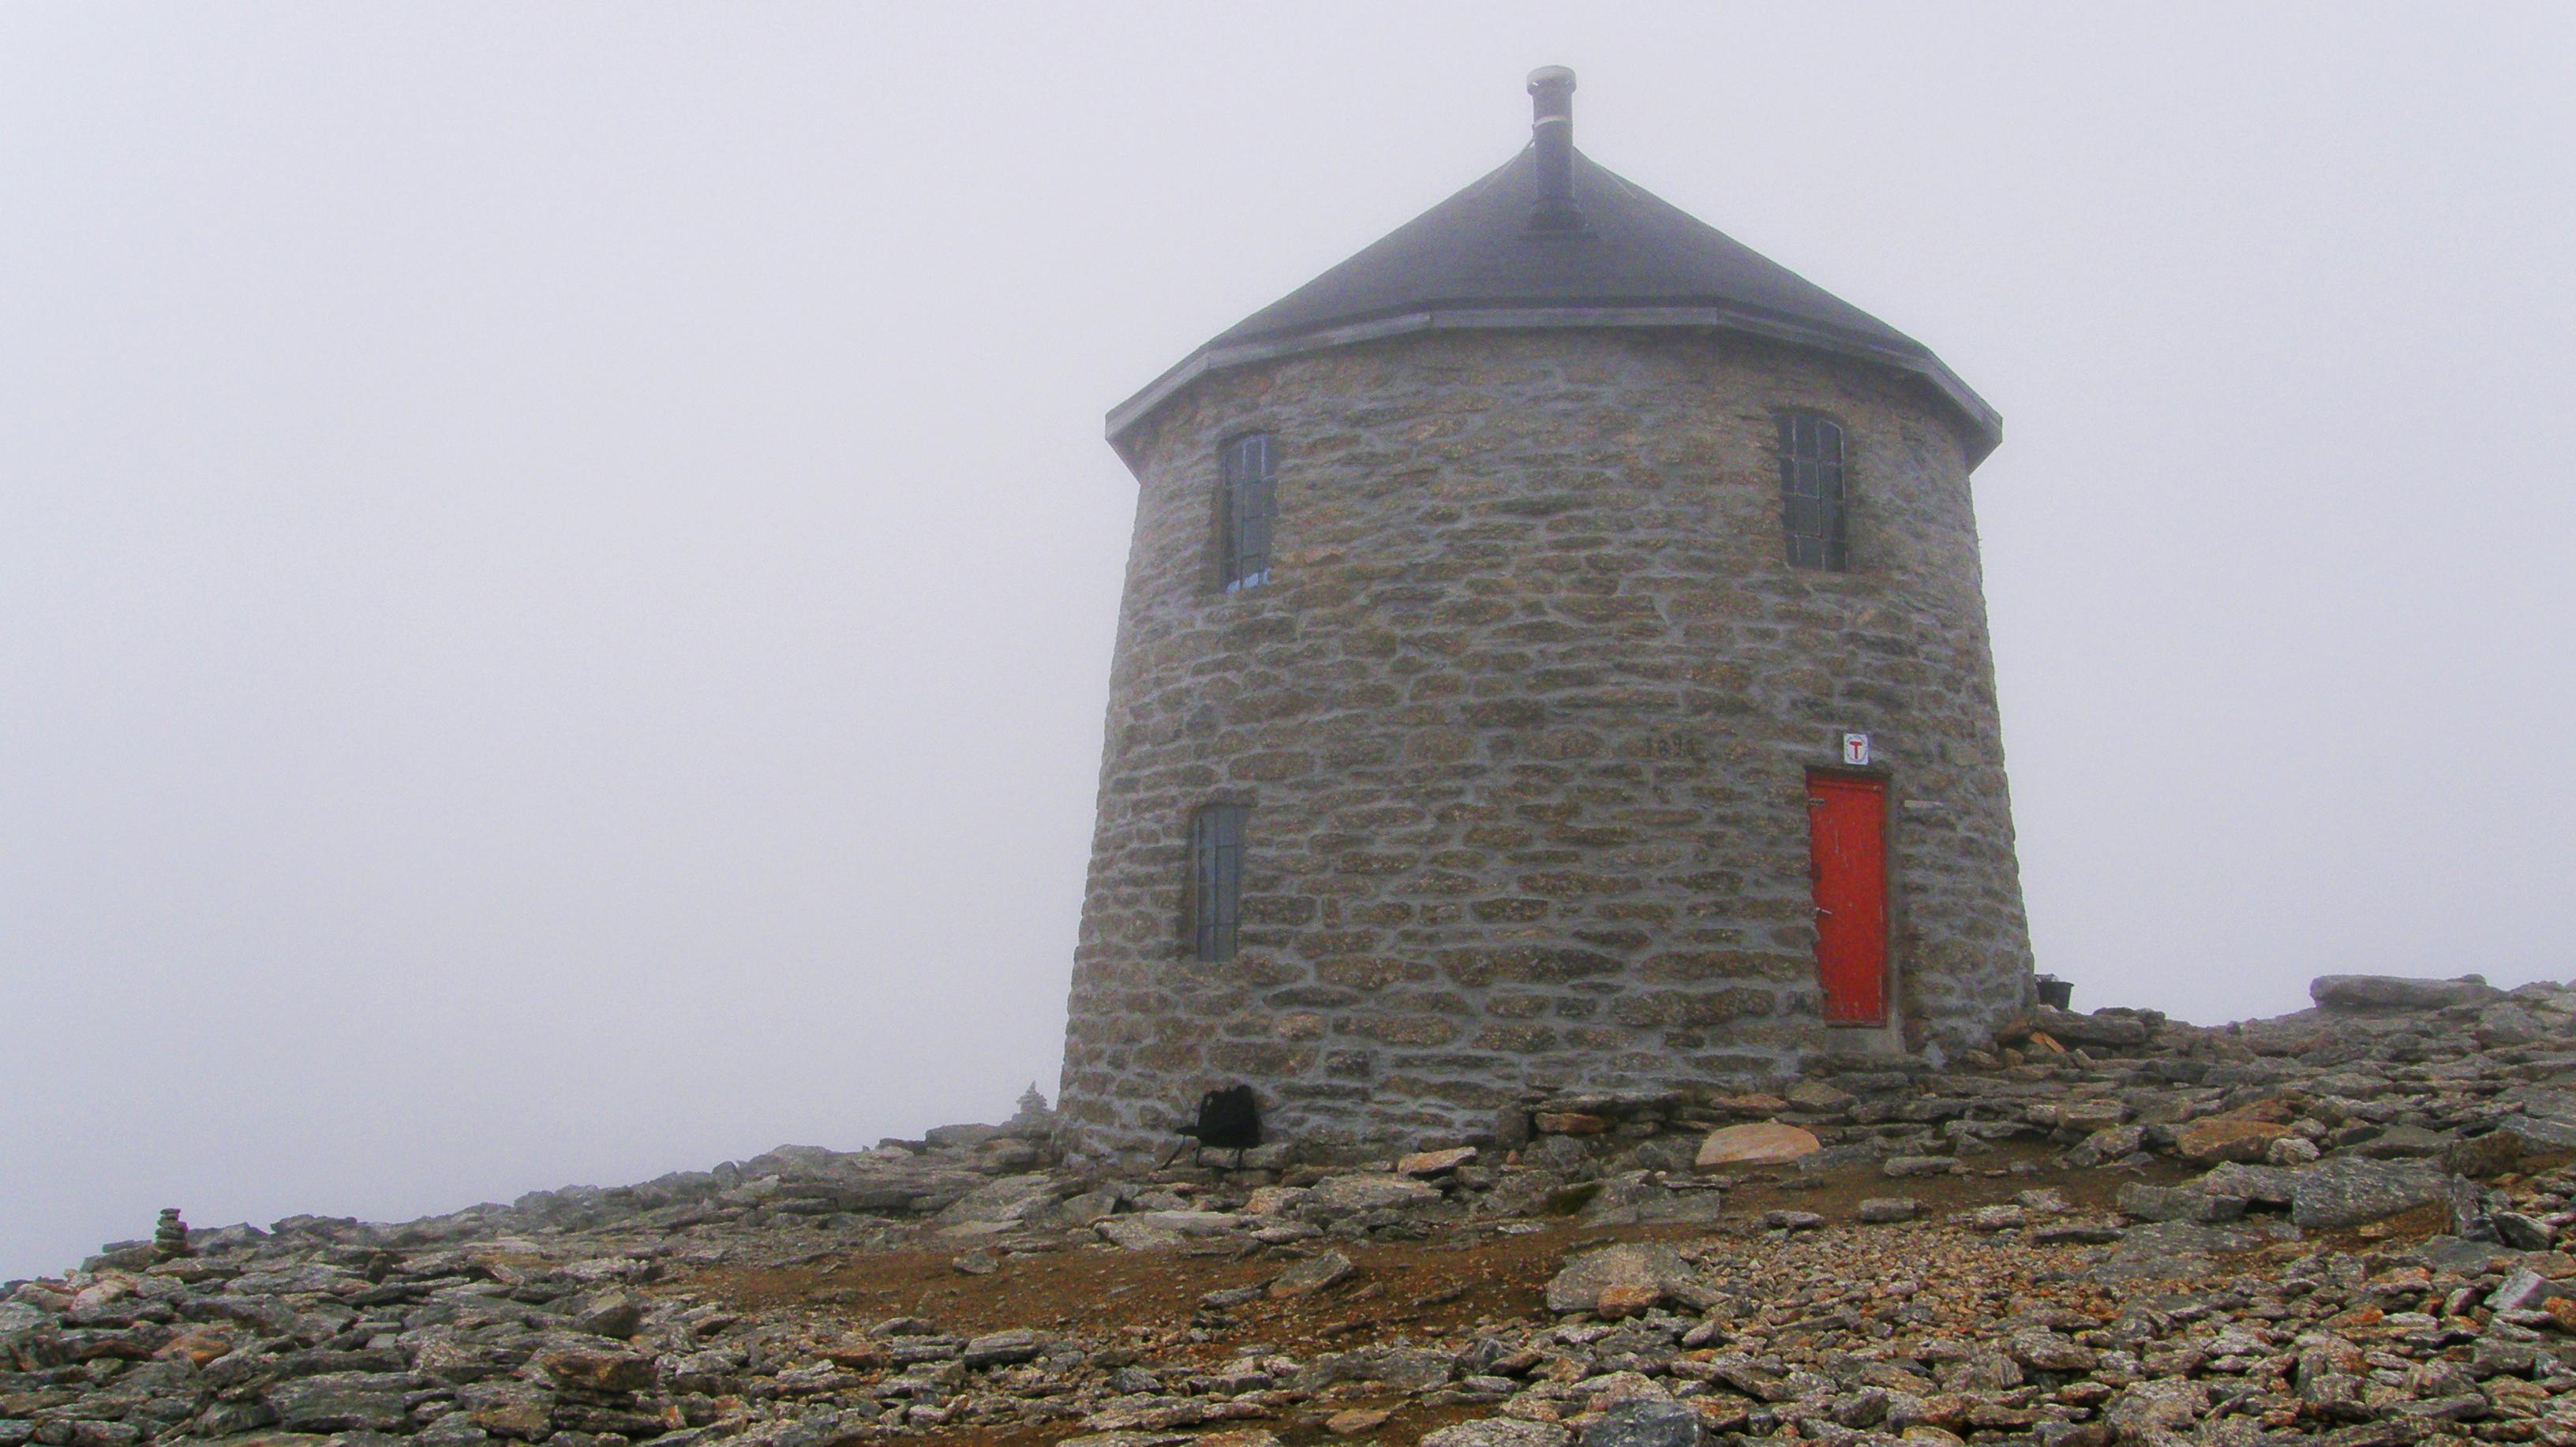 The tower at Mount Skaala by francis1ari